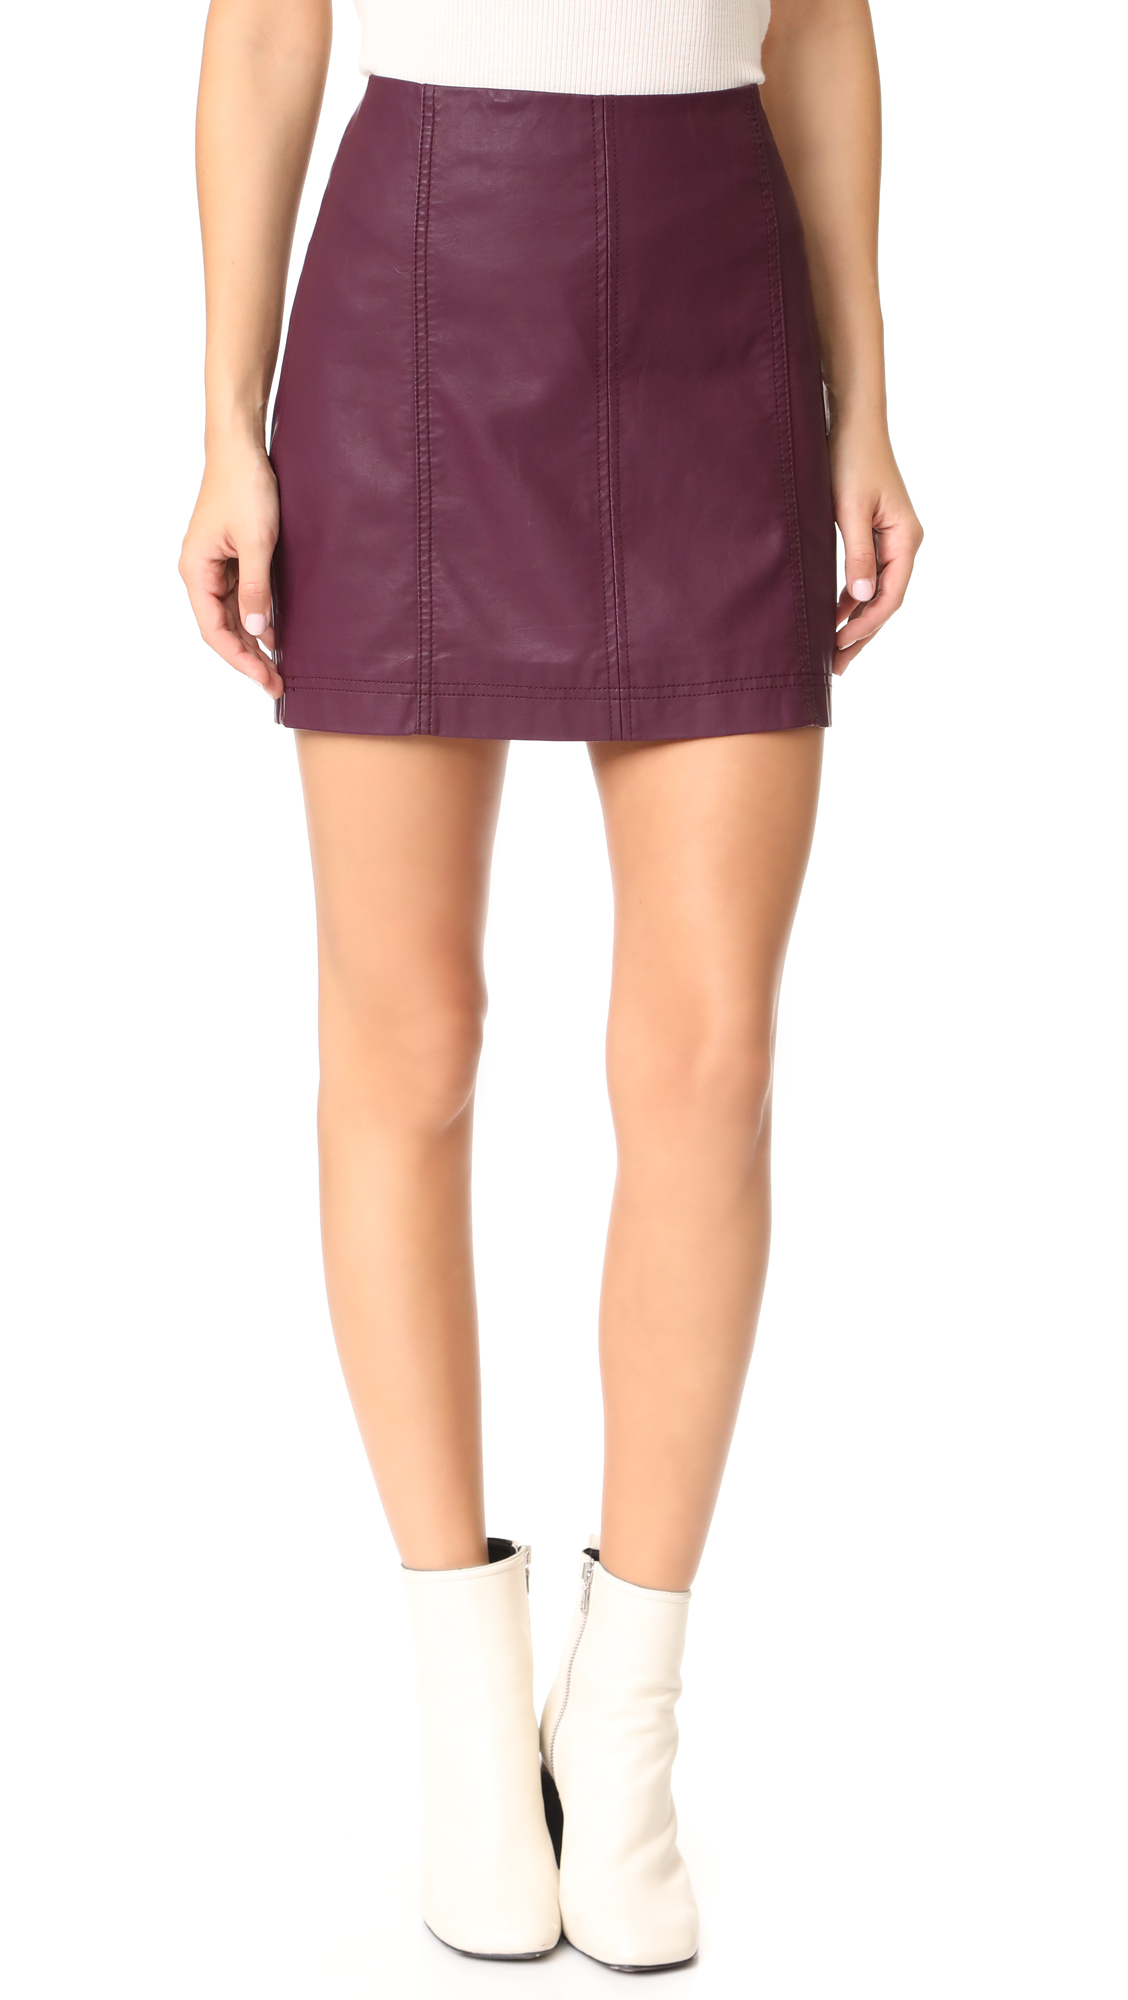 Free People Modern Femme Vegan Miniskirt - Wine